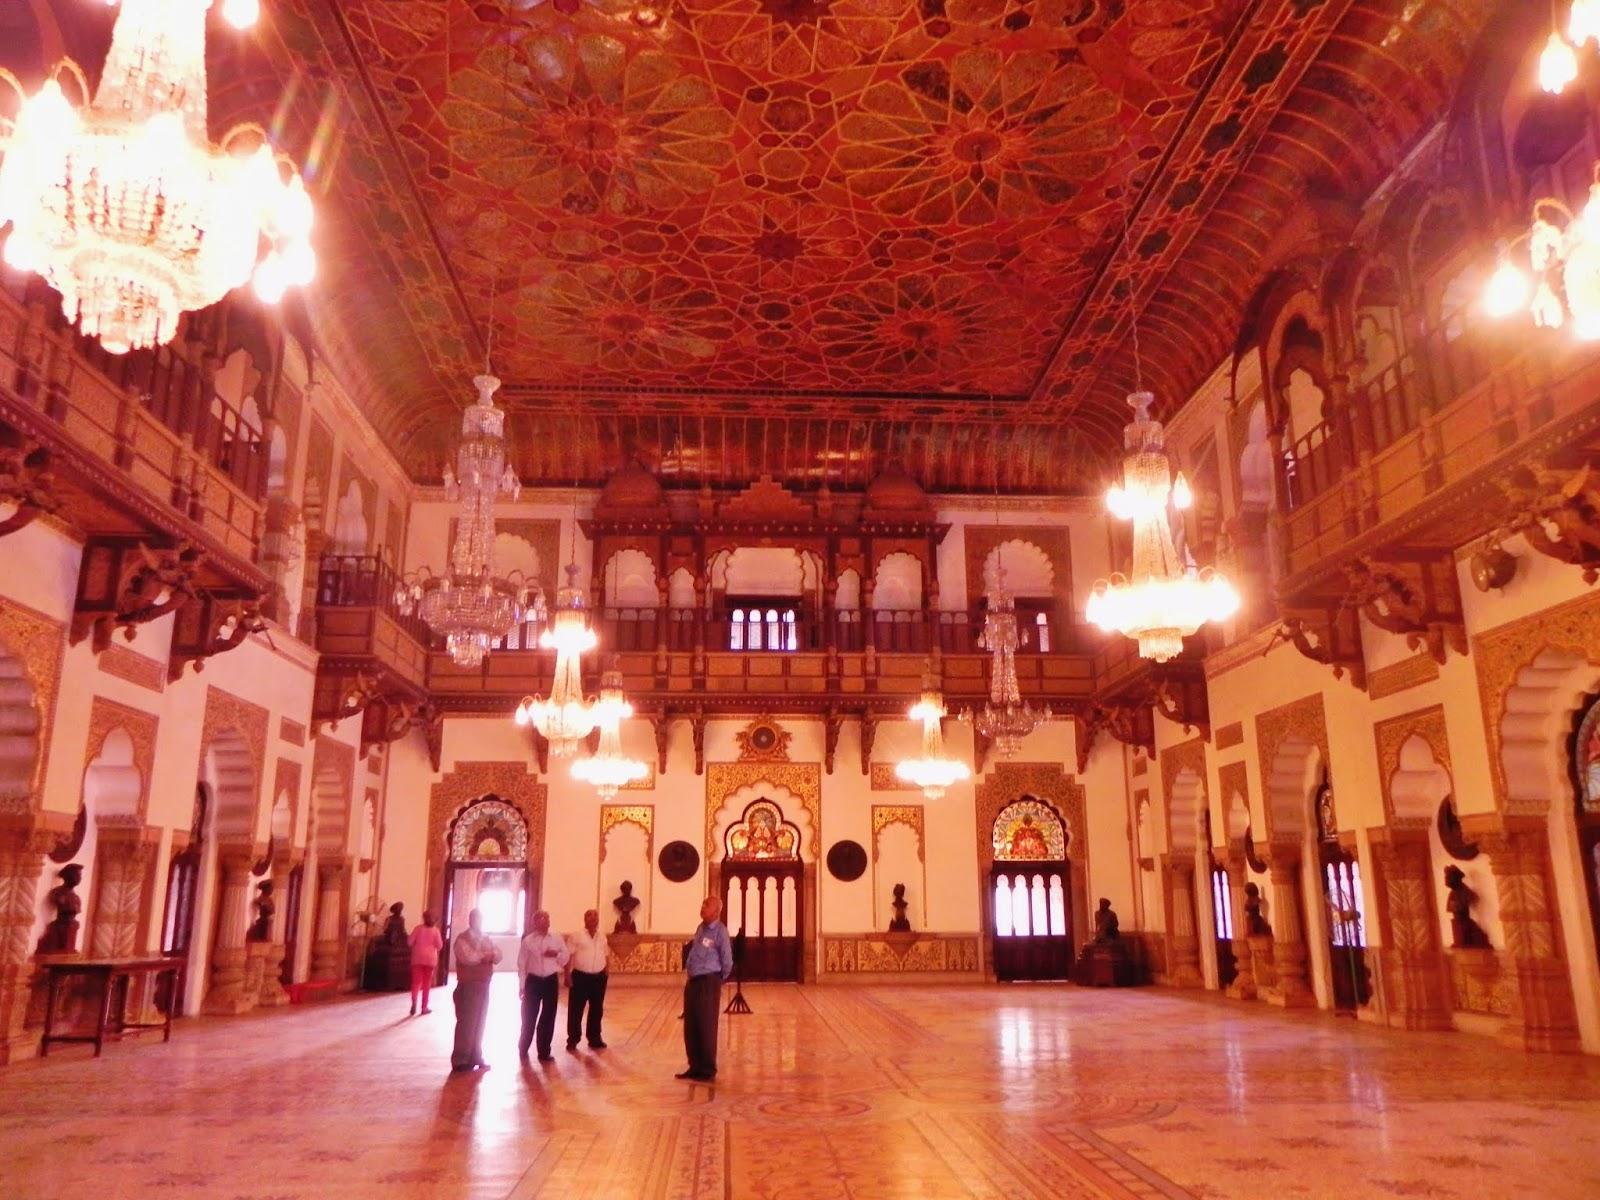 Dabar_Hall_of_Laxmi_Vilas_Palace,_Baroda